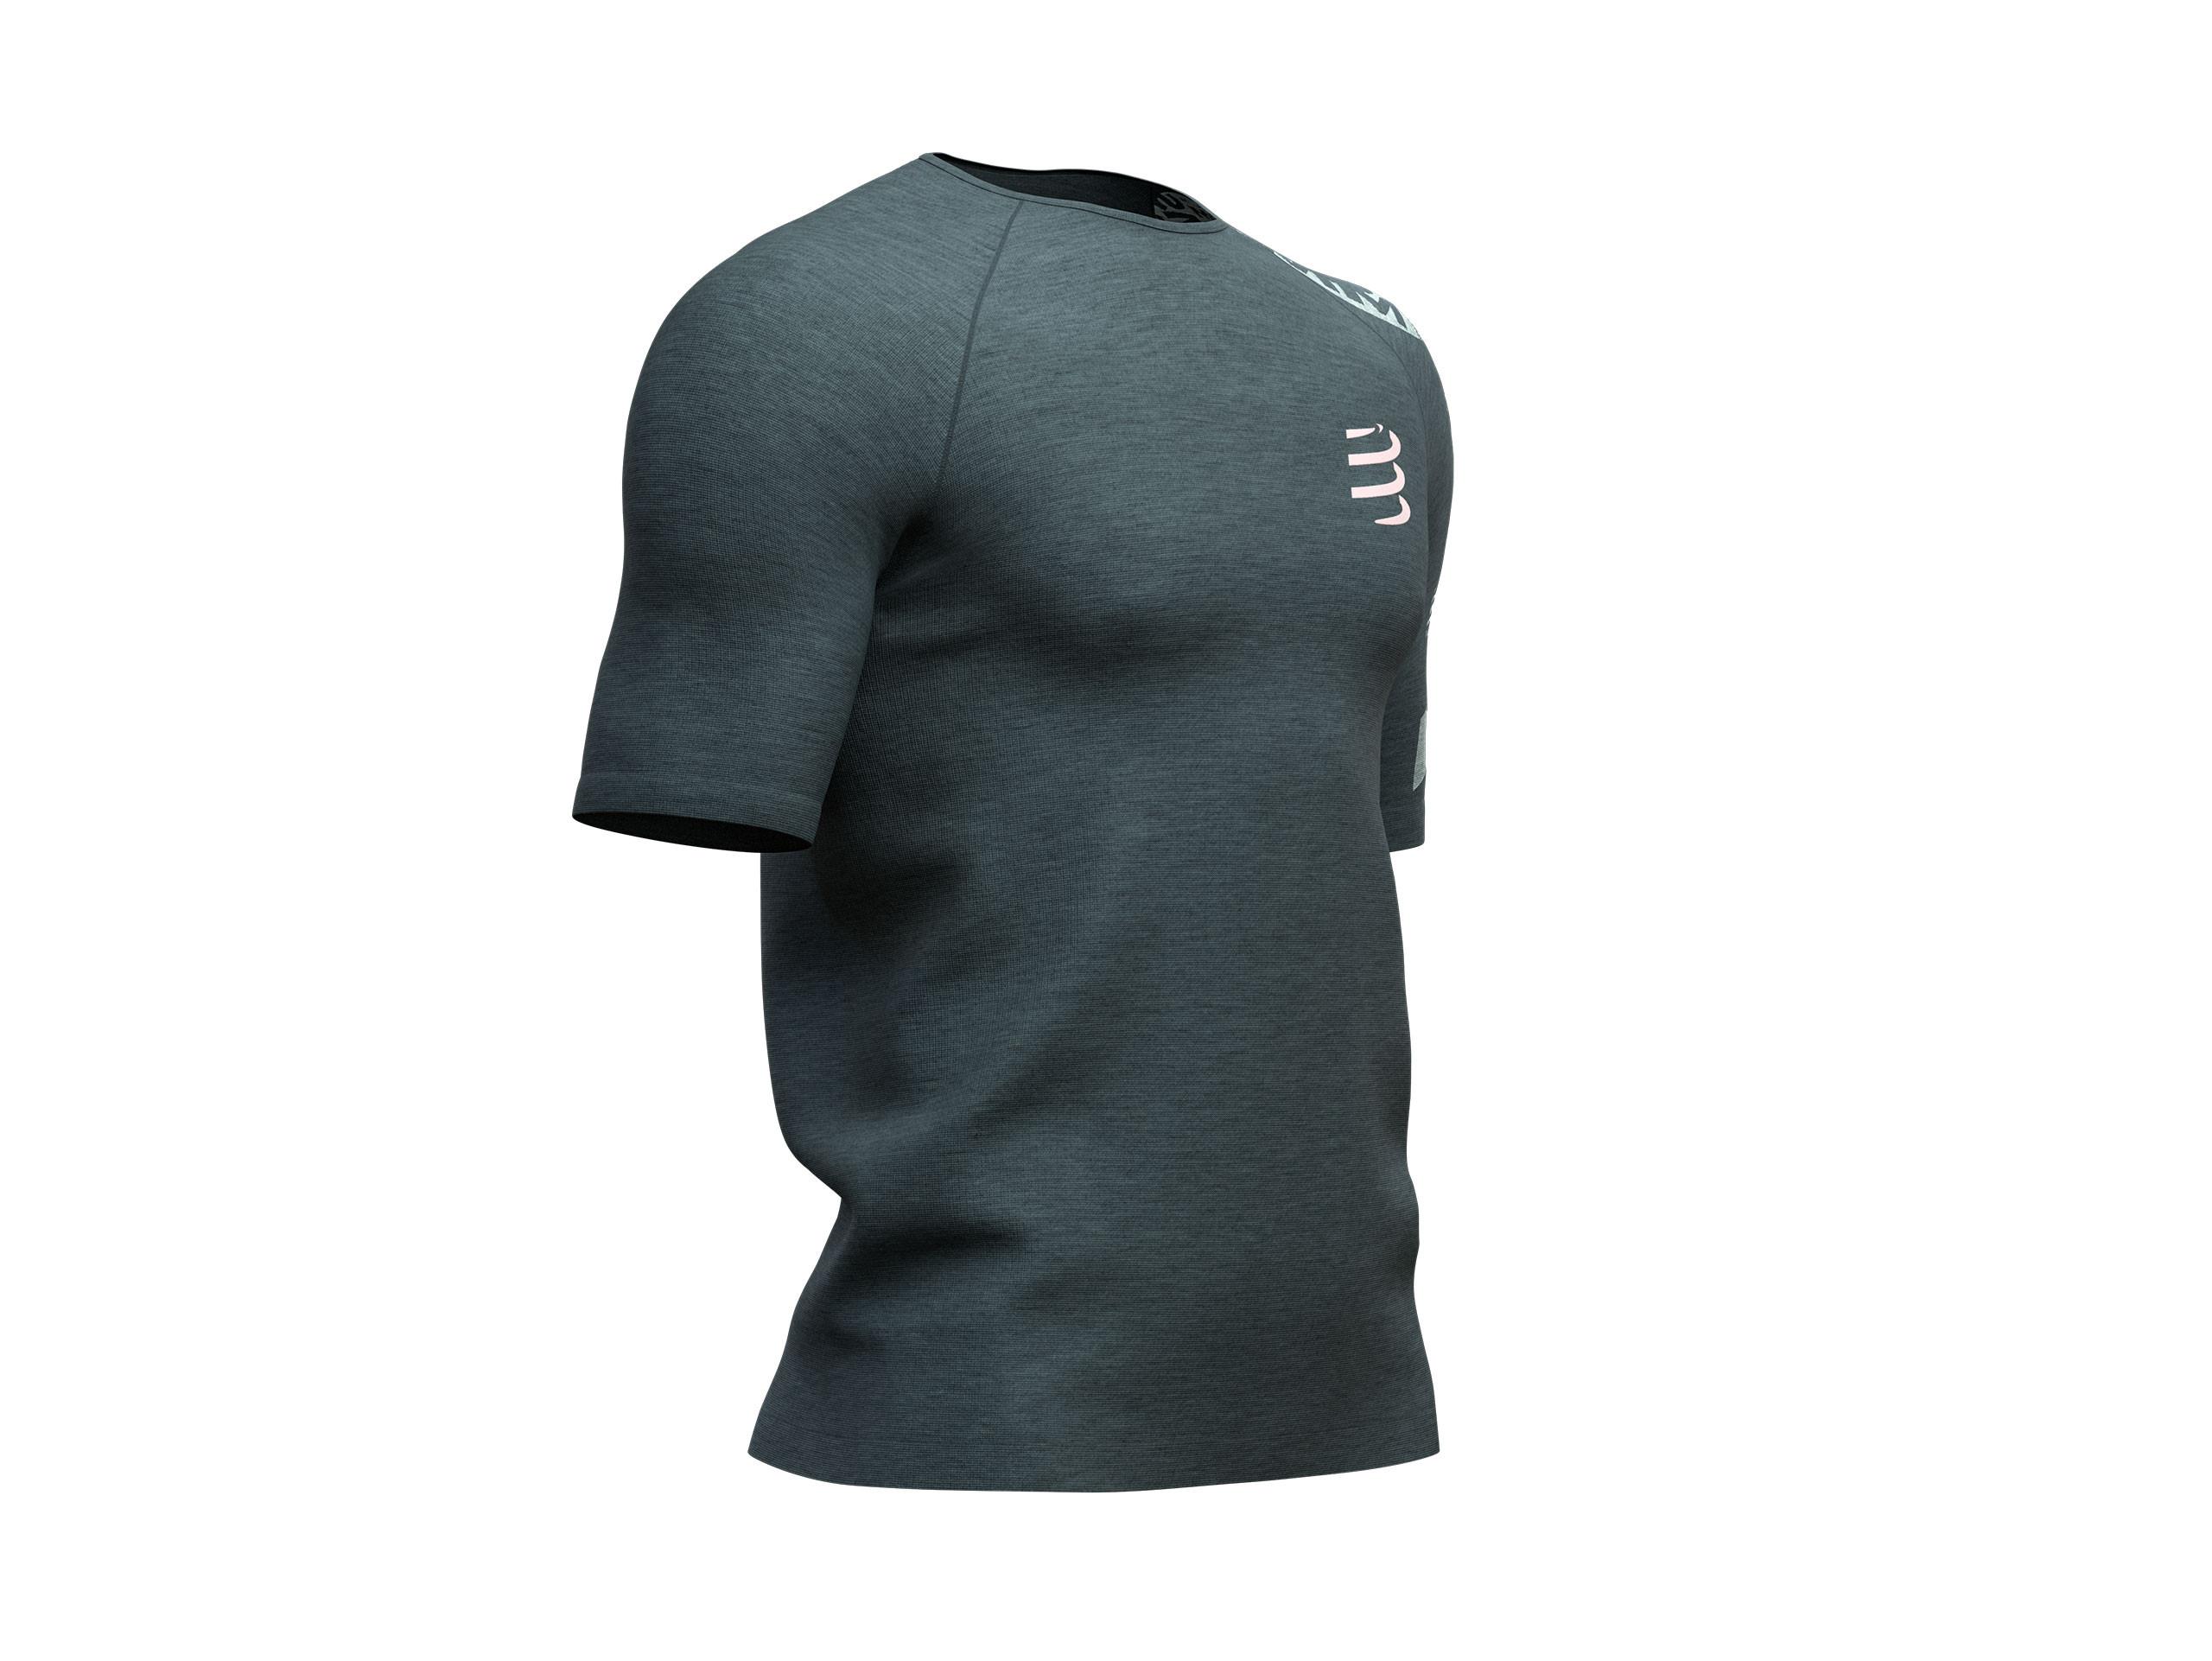 Kurzärmeliges Trainigsshirt - Born To SwimBikeRun 2019